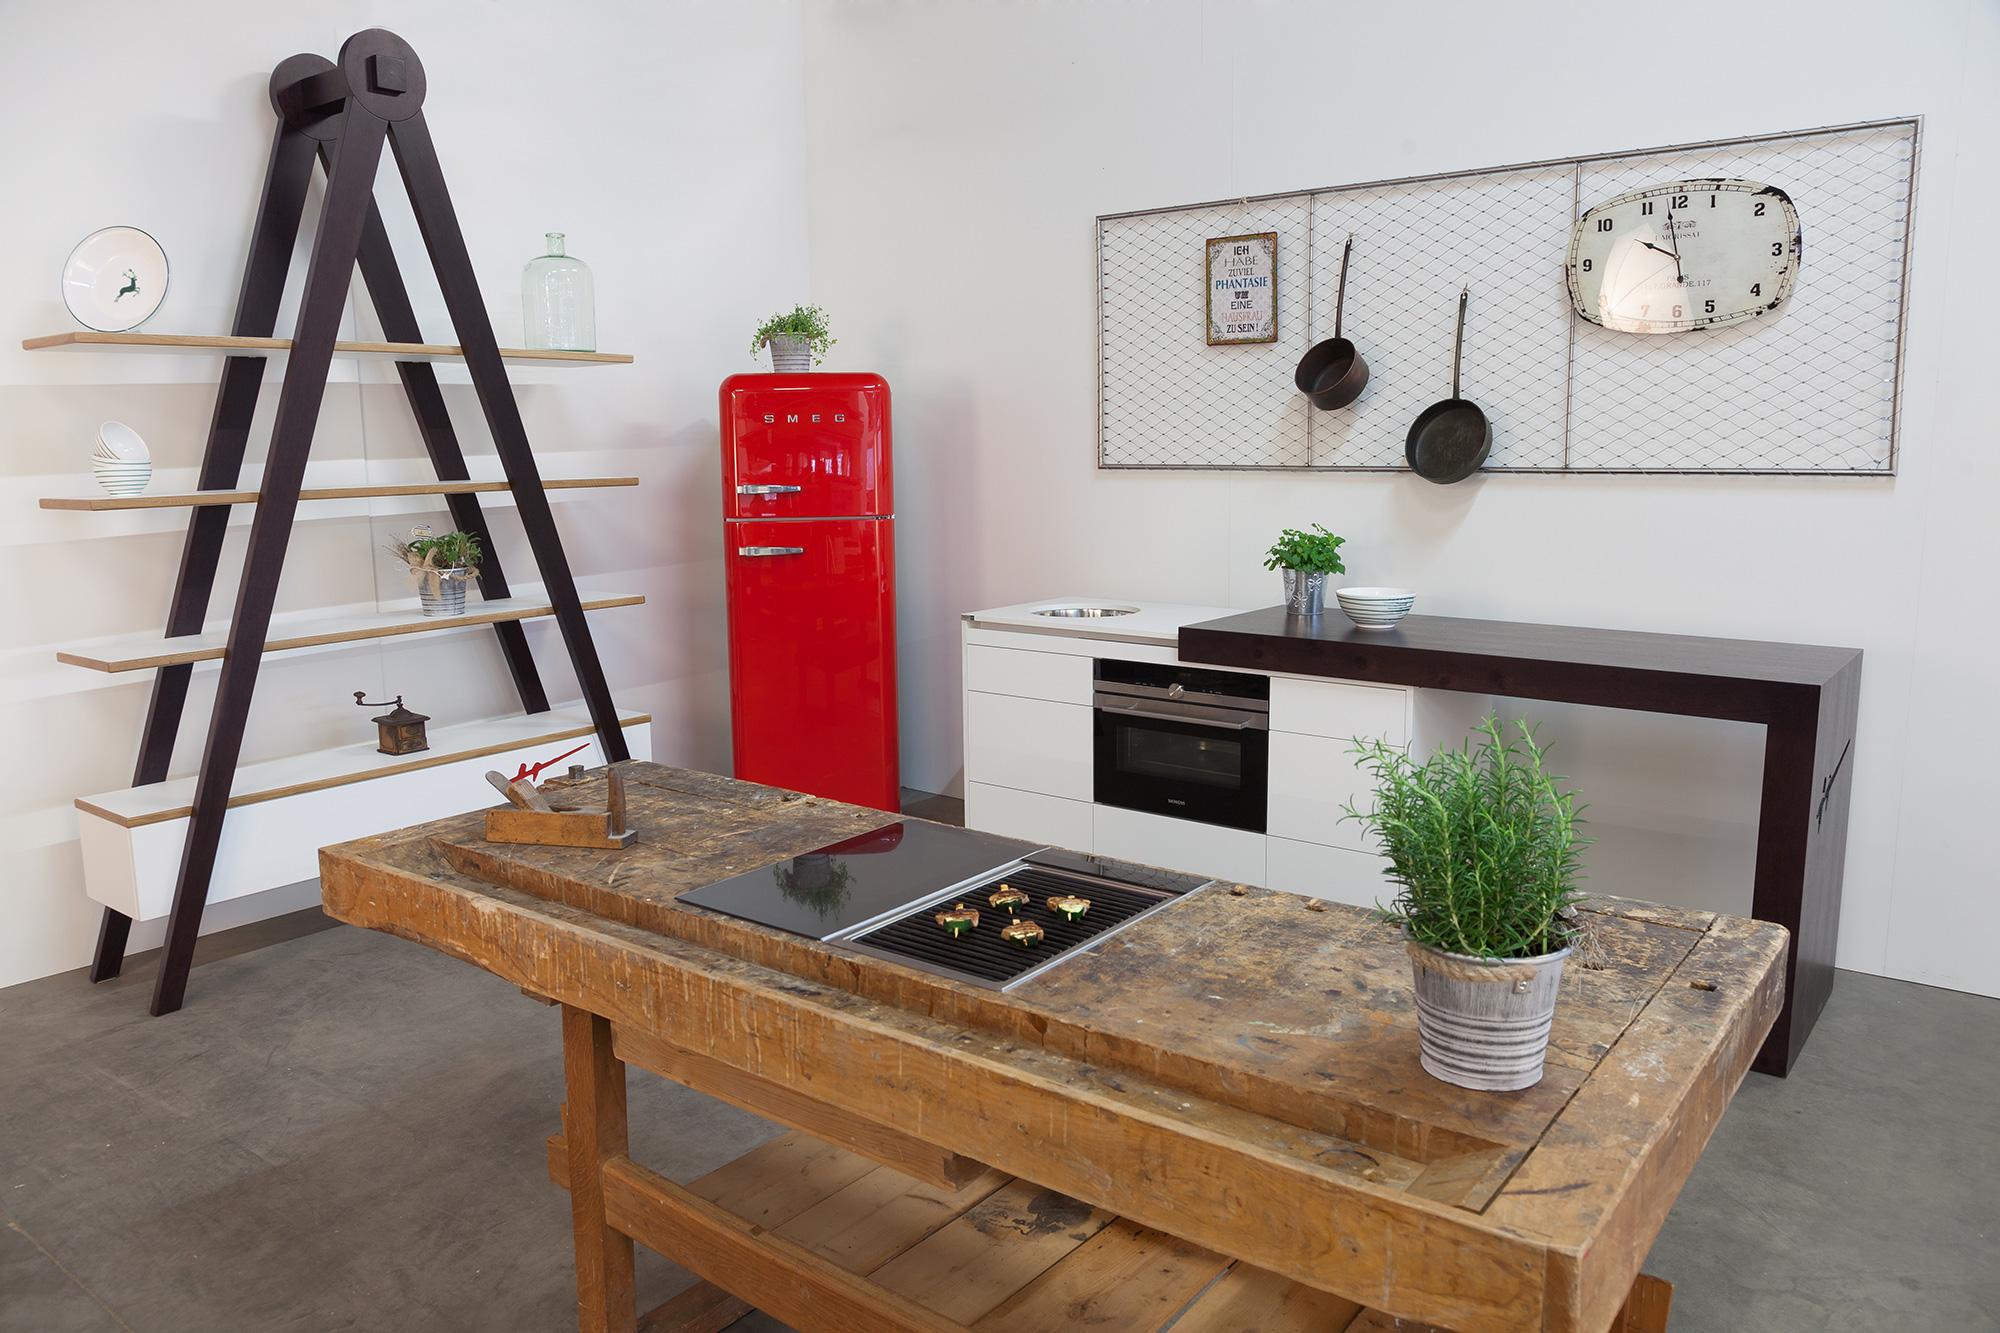 kompaktküche-ckdesign-cornelia-kronberger-verstellbar-designküche-smeg-hobelbankgrill-grillplatte-hobelbankküche-1